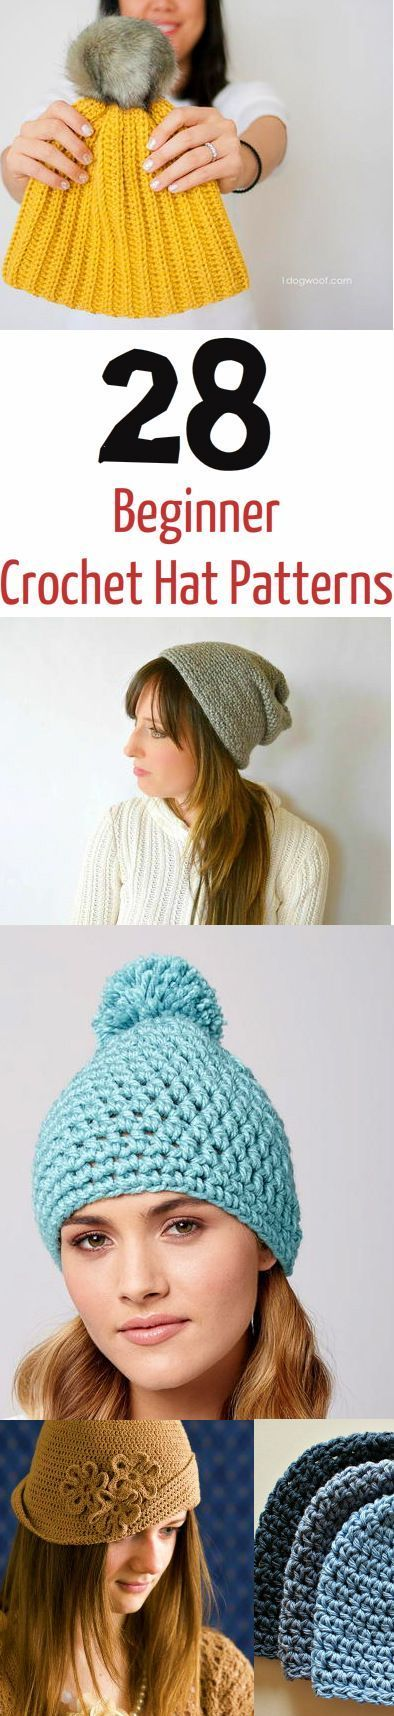 50+ padrões de chapéu de crochê iniciante